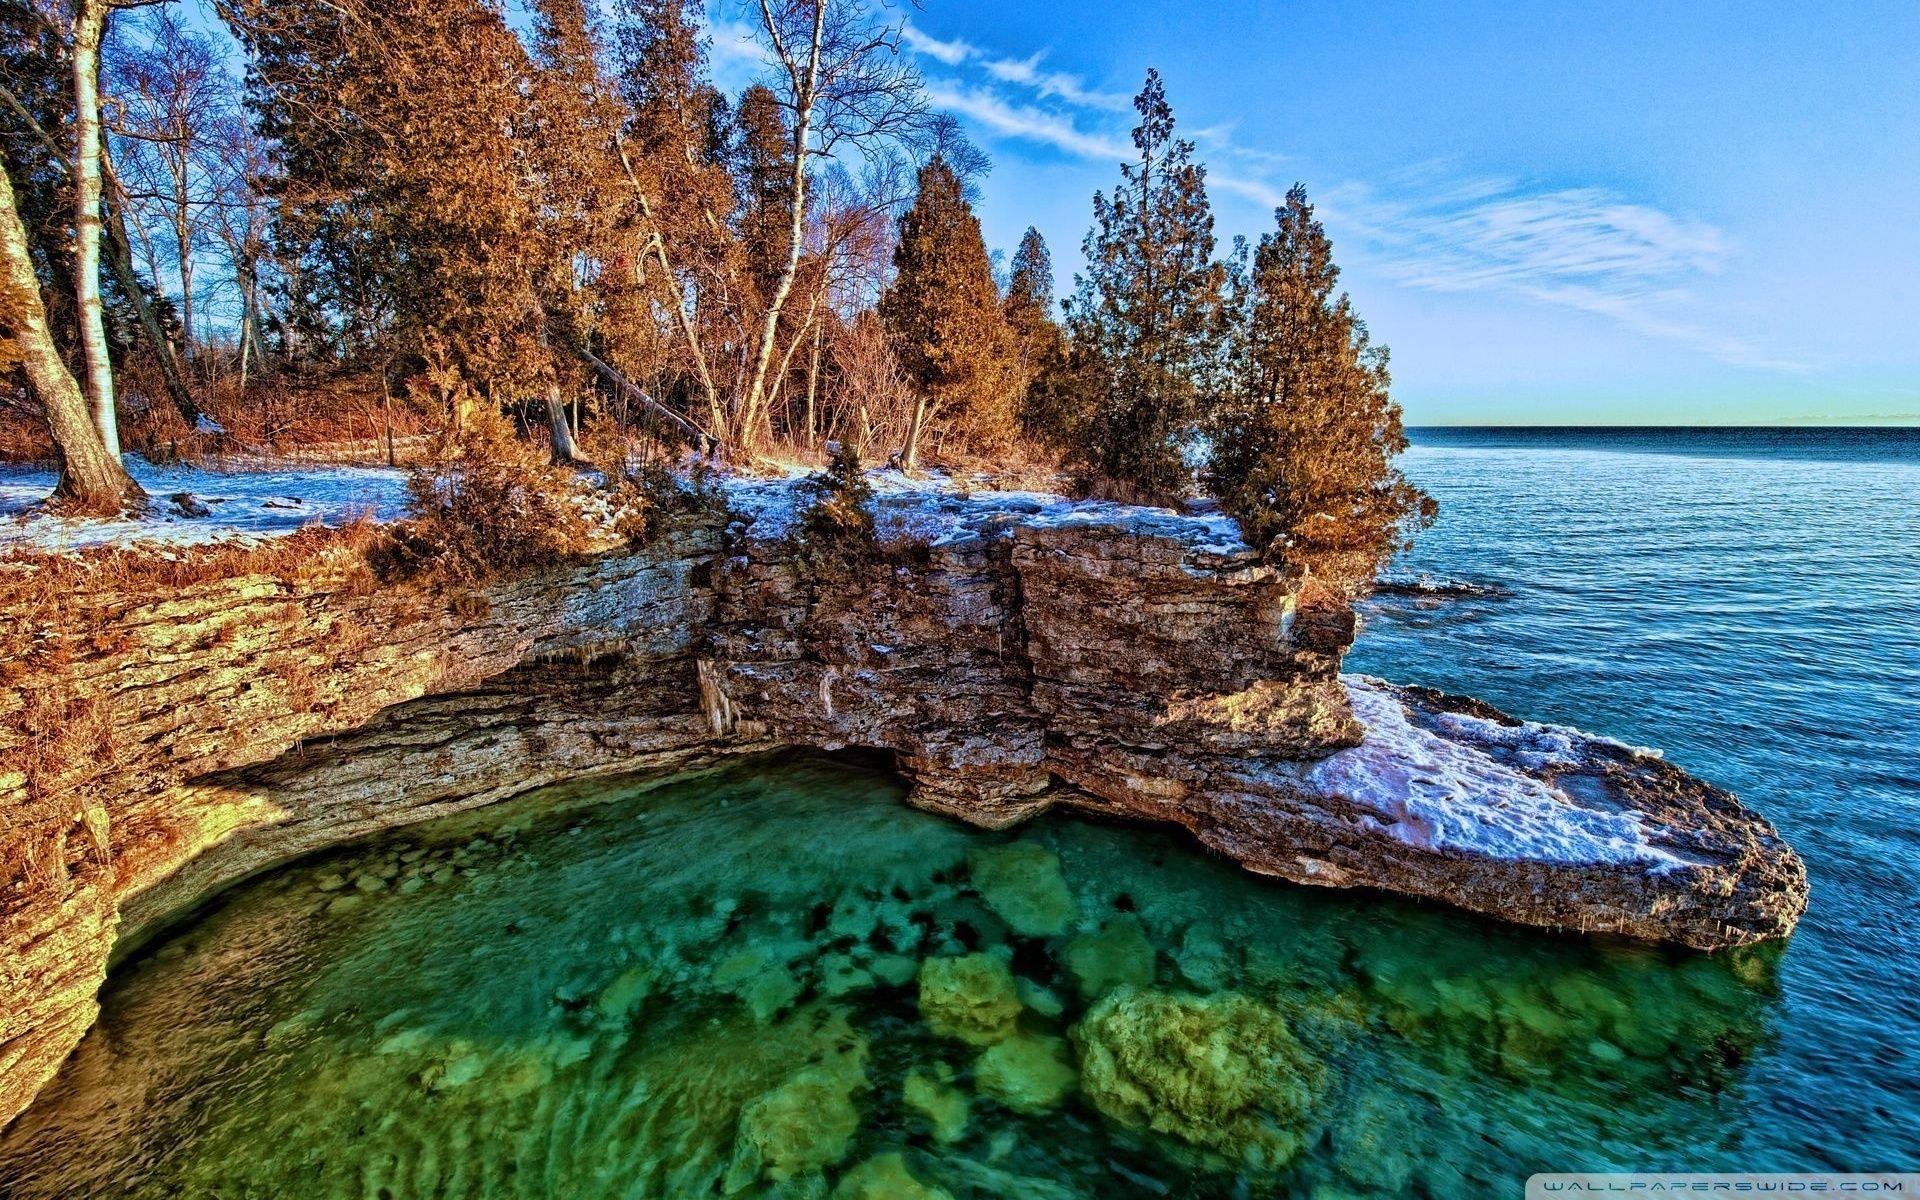 wp2204726-lake-michigan-wallpapers